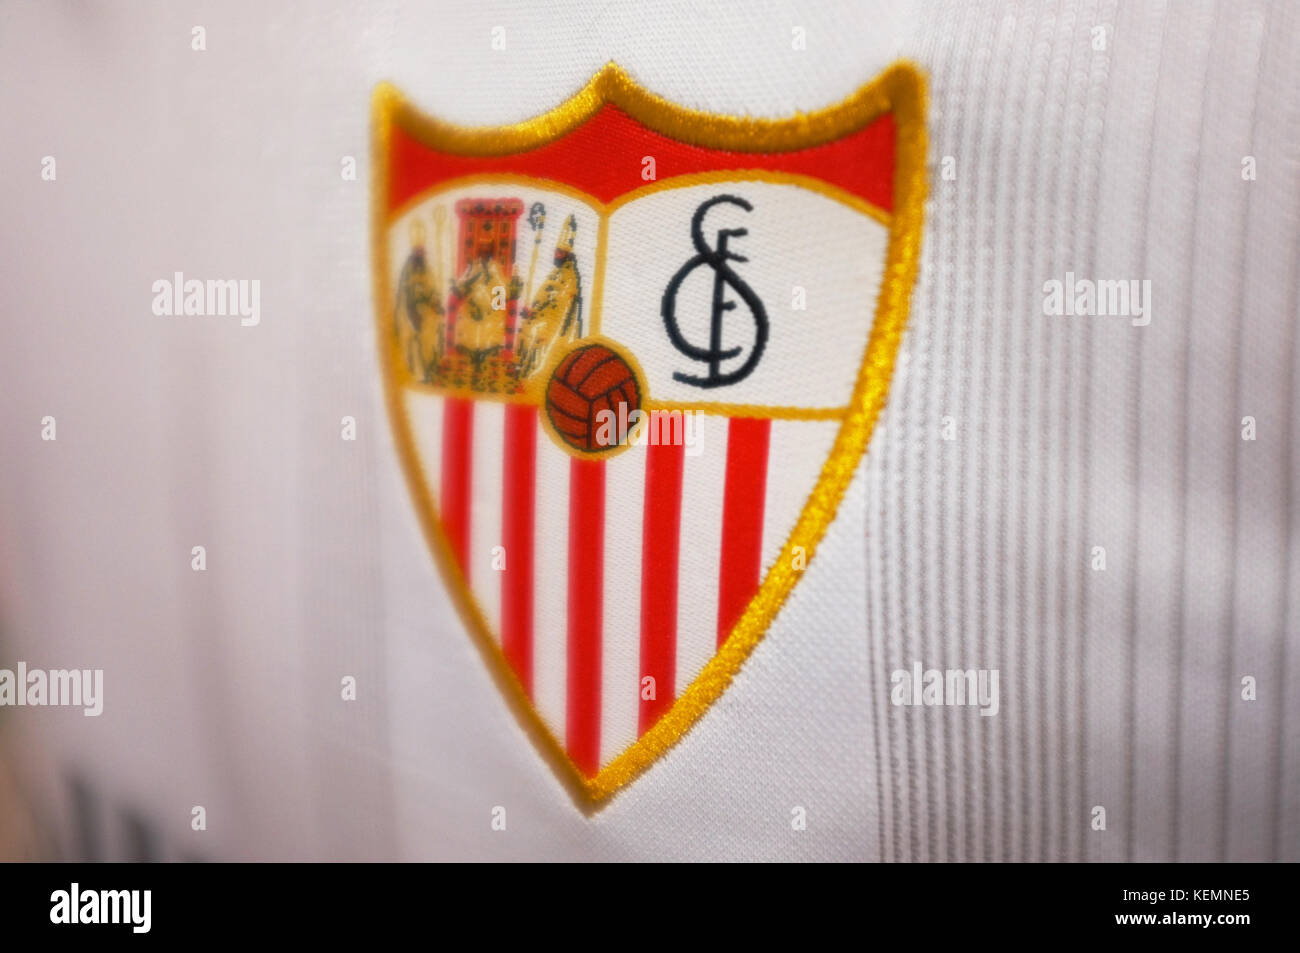 The Crest Of Sevilla Fc On A Shirt In The Shop At Ramon Sanchez Pizjuan Stadium Sevilla Fc Vs Las Palmas Seville Andalucia Spain September 2017 Stock Photo Alamy